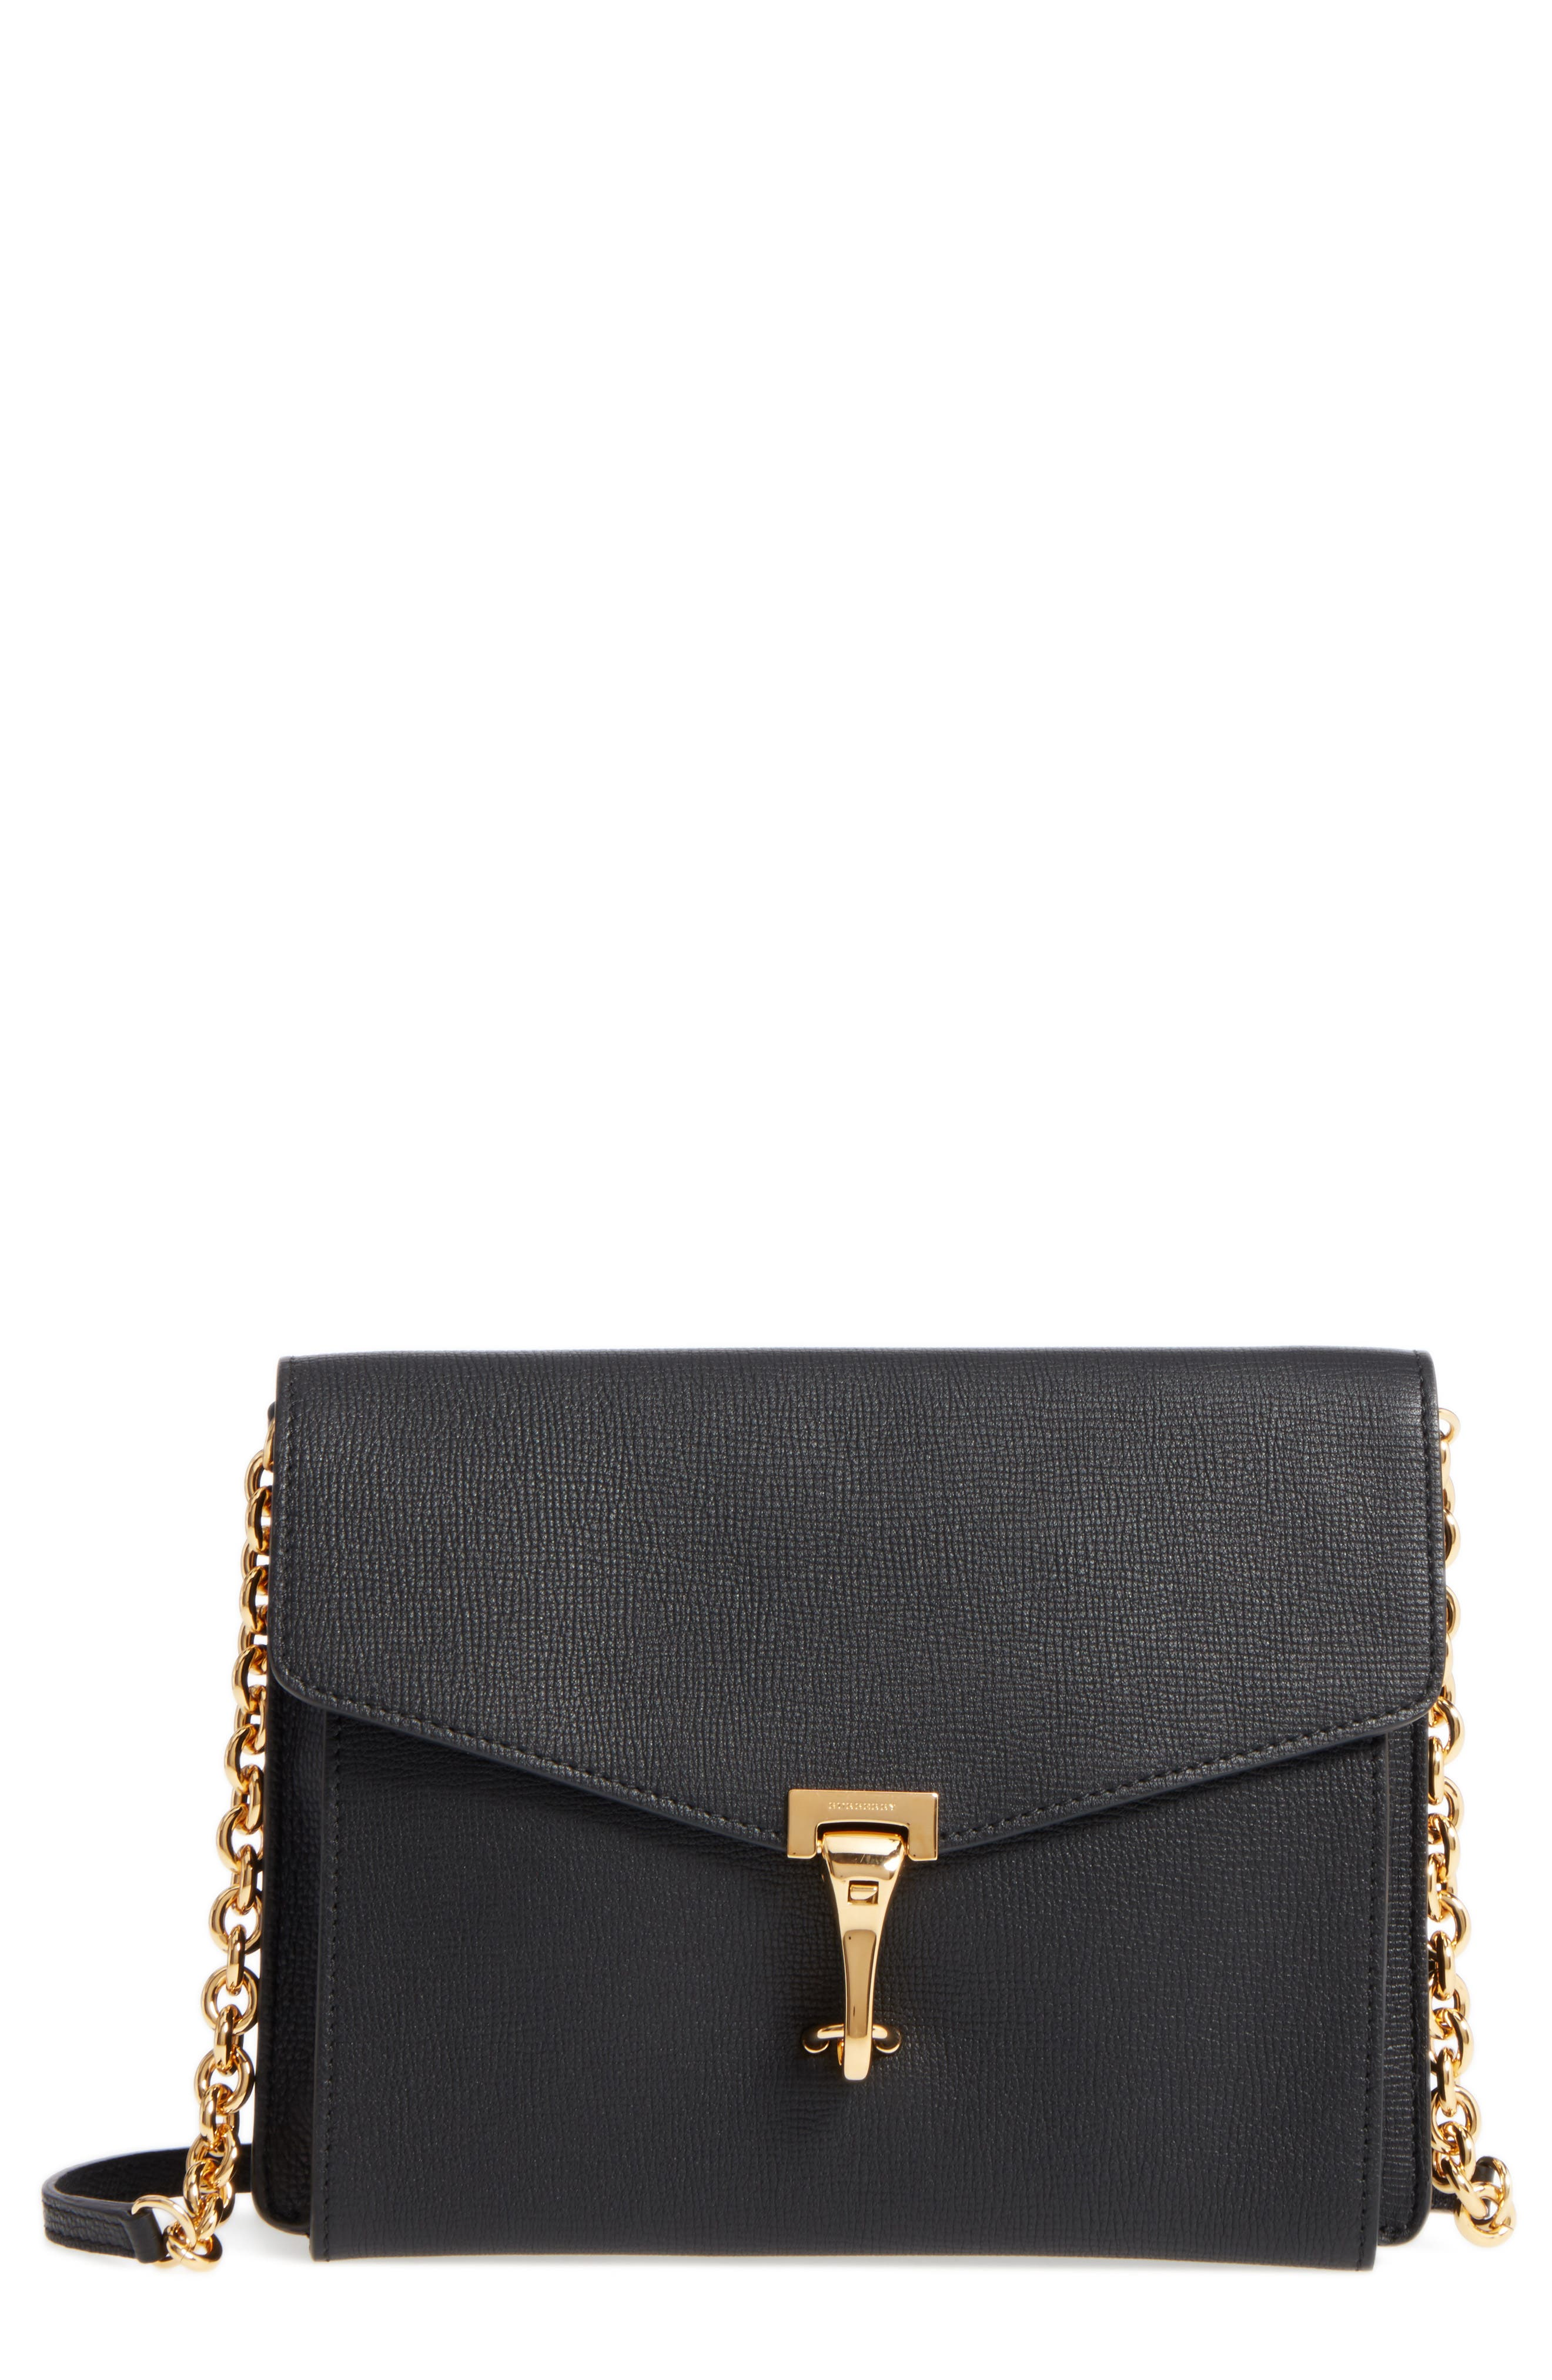 Macken Leather Crossbody Bag,                             Main thumbnail 1, color,                             001